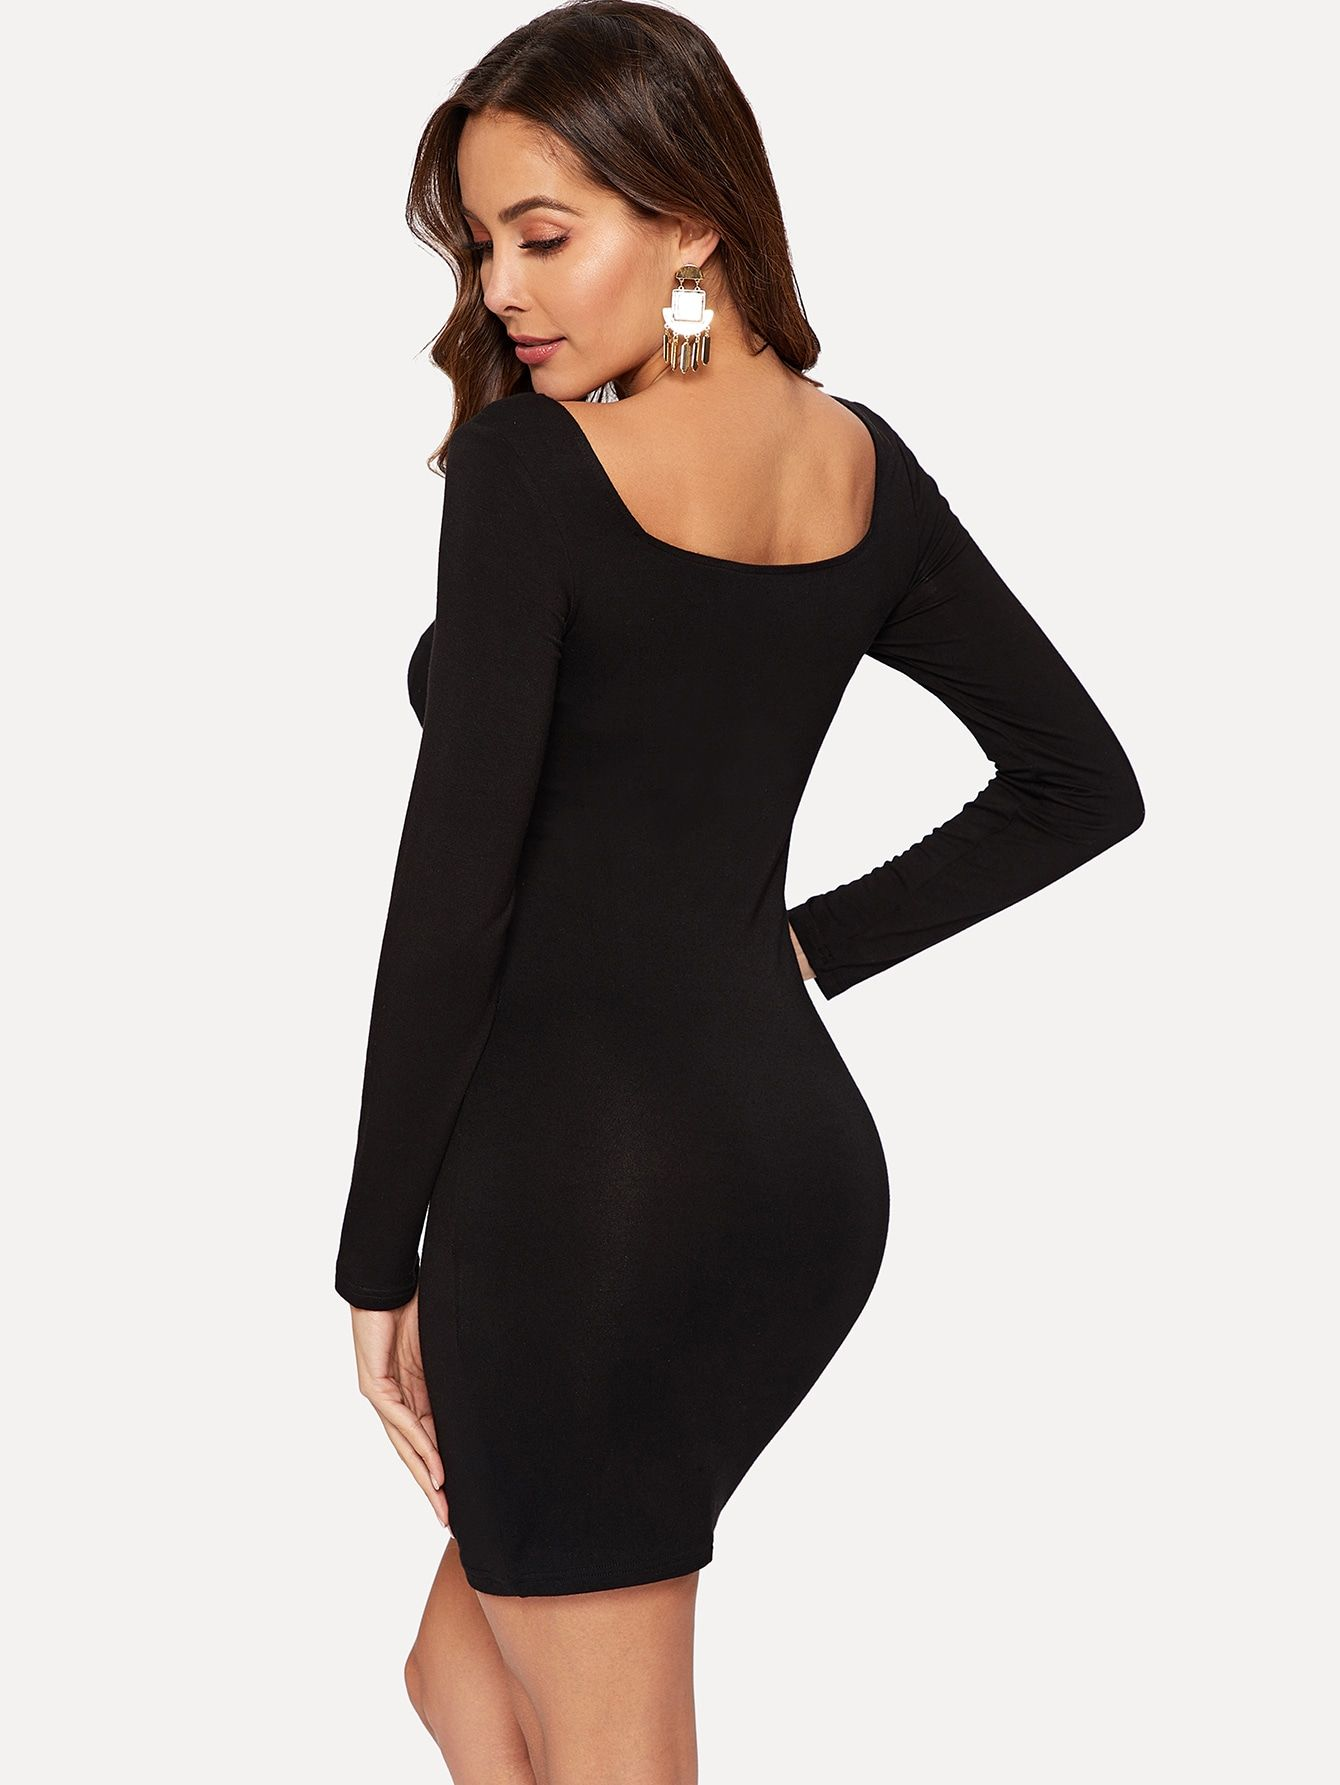 Zipper Up Double Square Neck Bodycon Dress Shein Sheinside Bodycon Dress Neck Bodycon Dress Dresses [ 1785 x 1340 Pixel ]